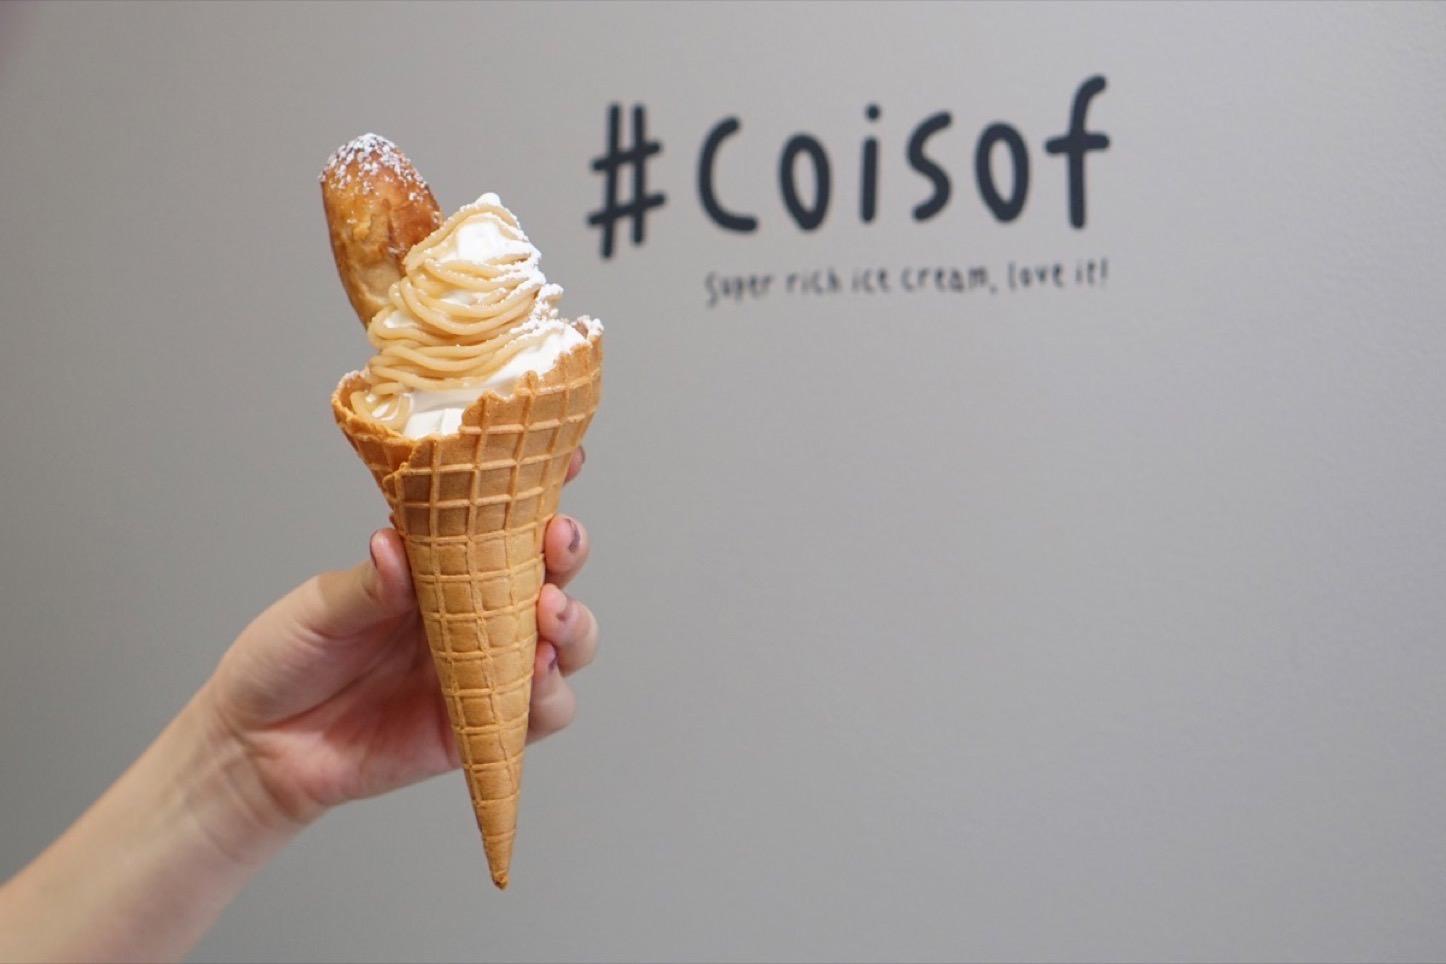 Coisof-Shiro-An-Koi-SoftCream-02.jpg